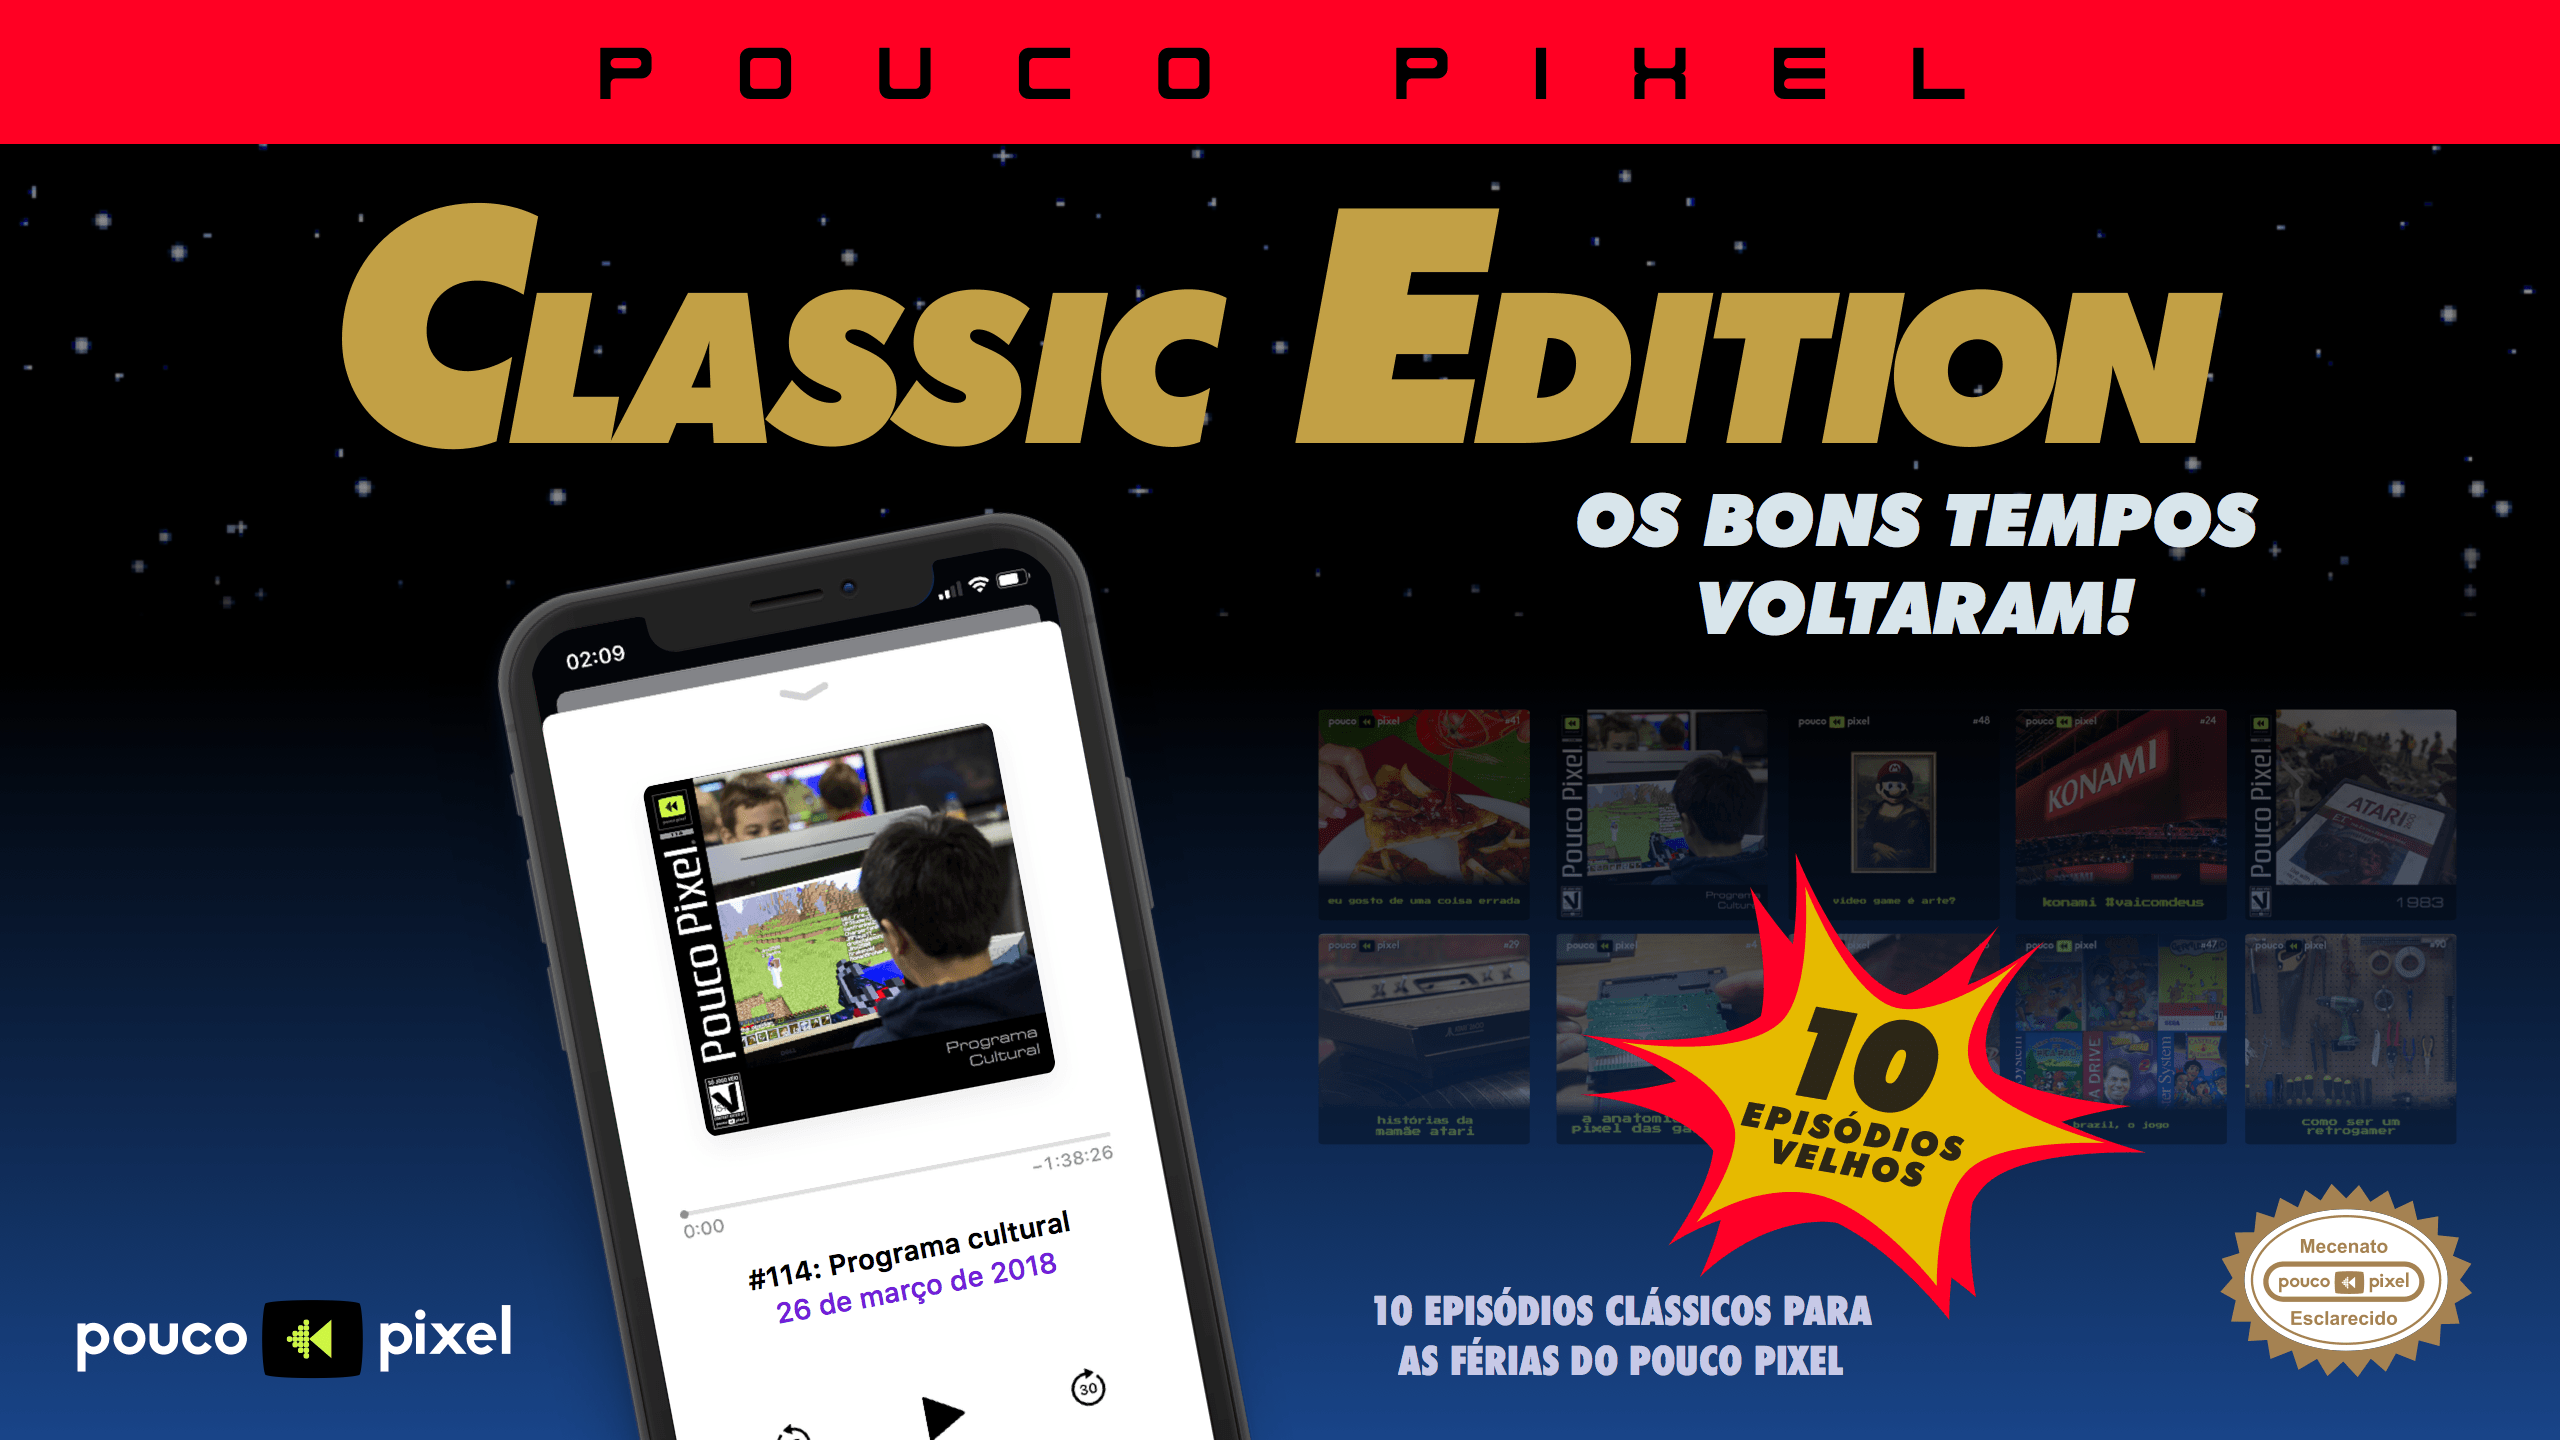 Pouco Pixel Classic Edition 2 – Programa cultural